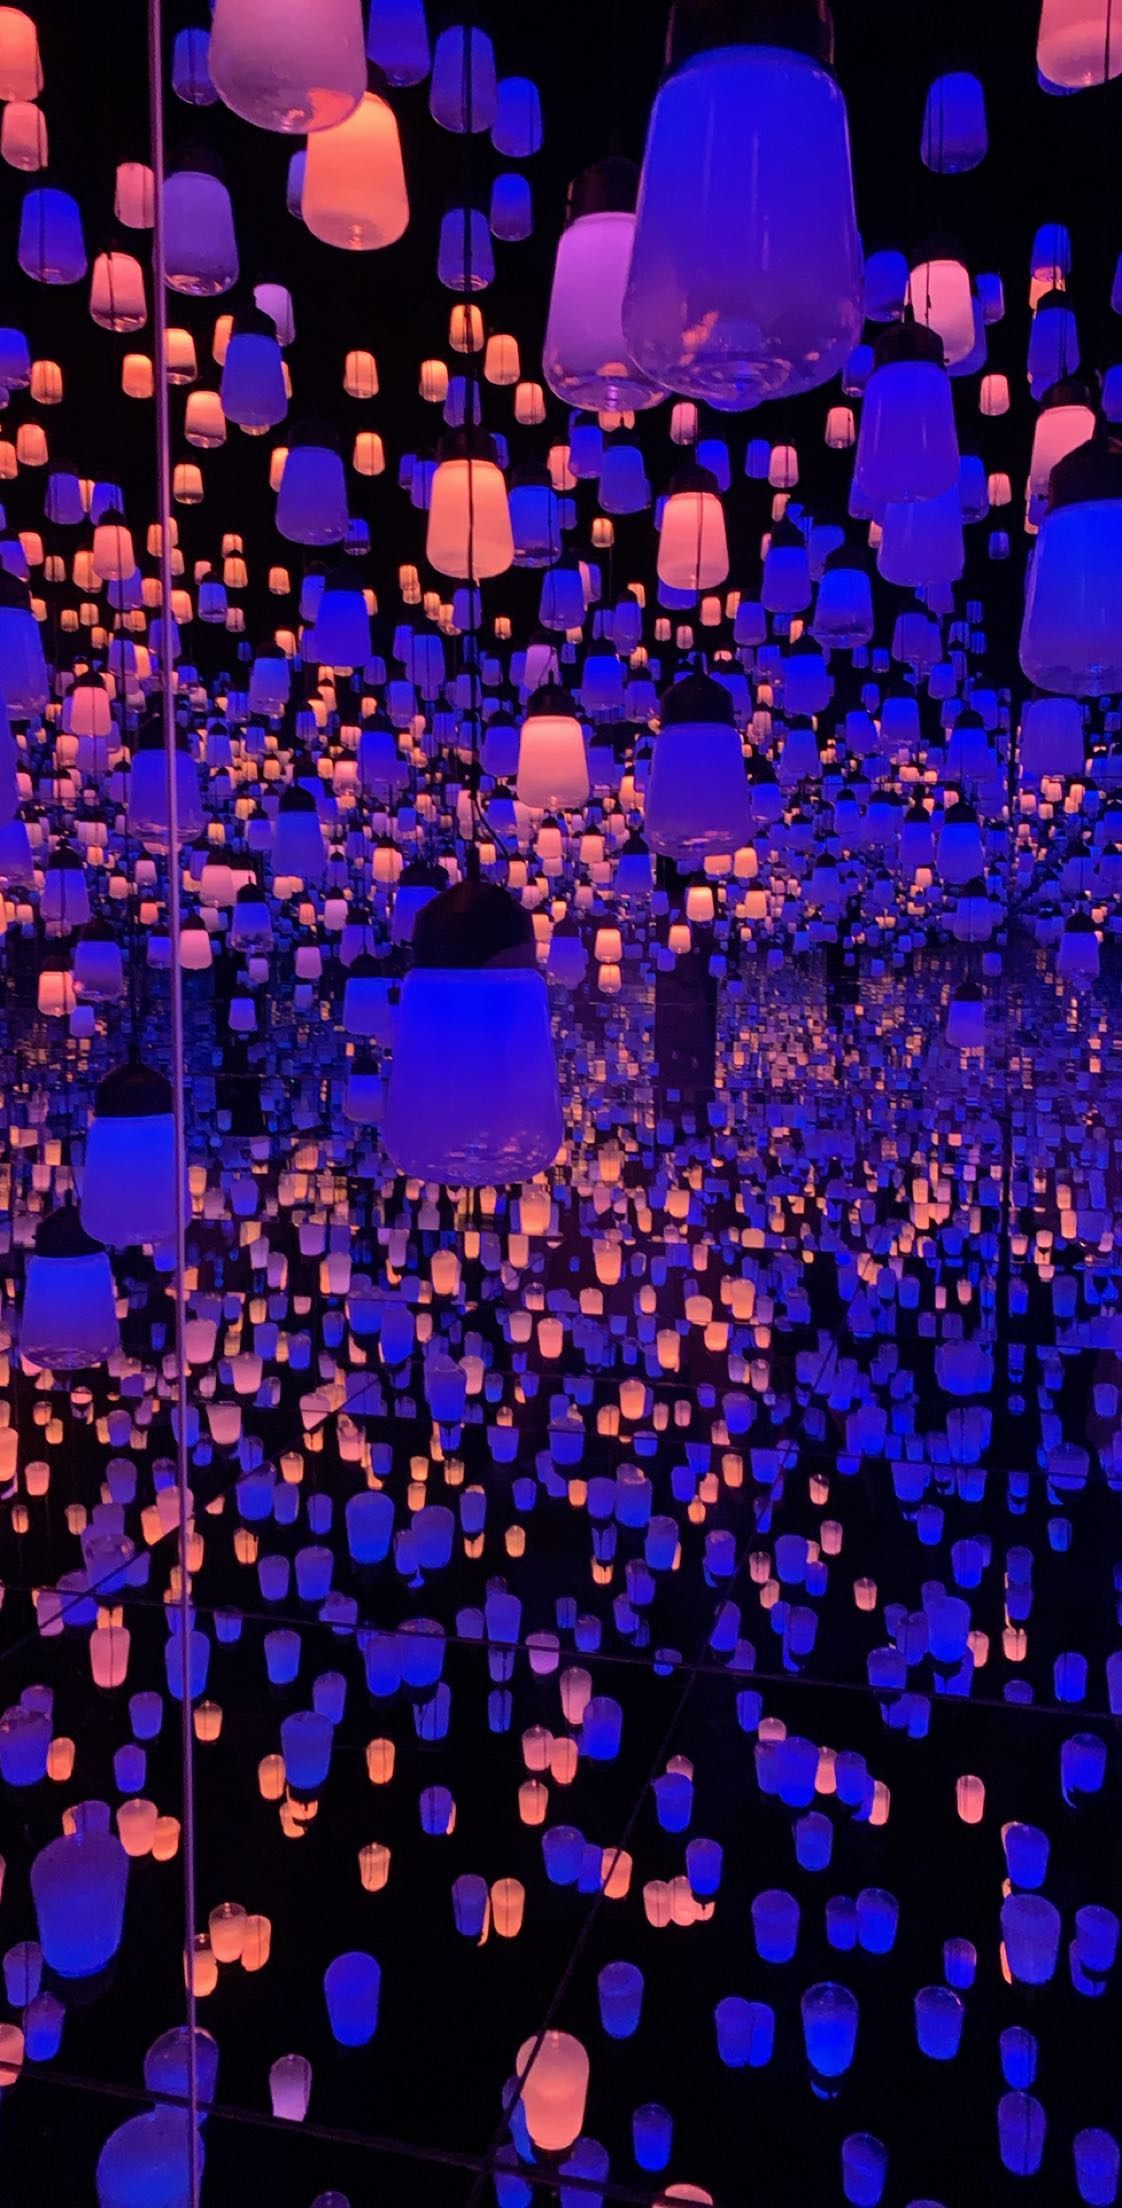 The EPSON TeamLab Borderless exhibit in Tokyo displaying hanging lamps